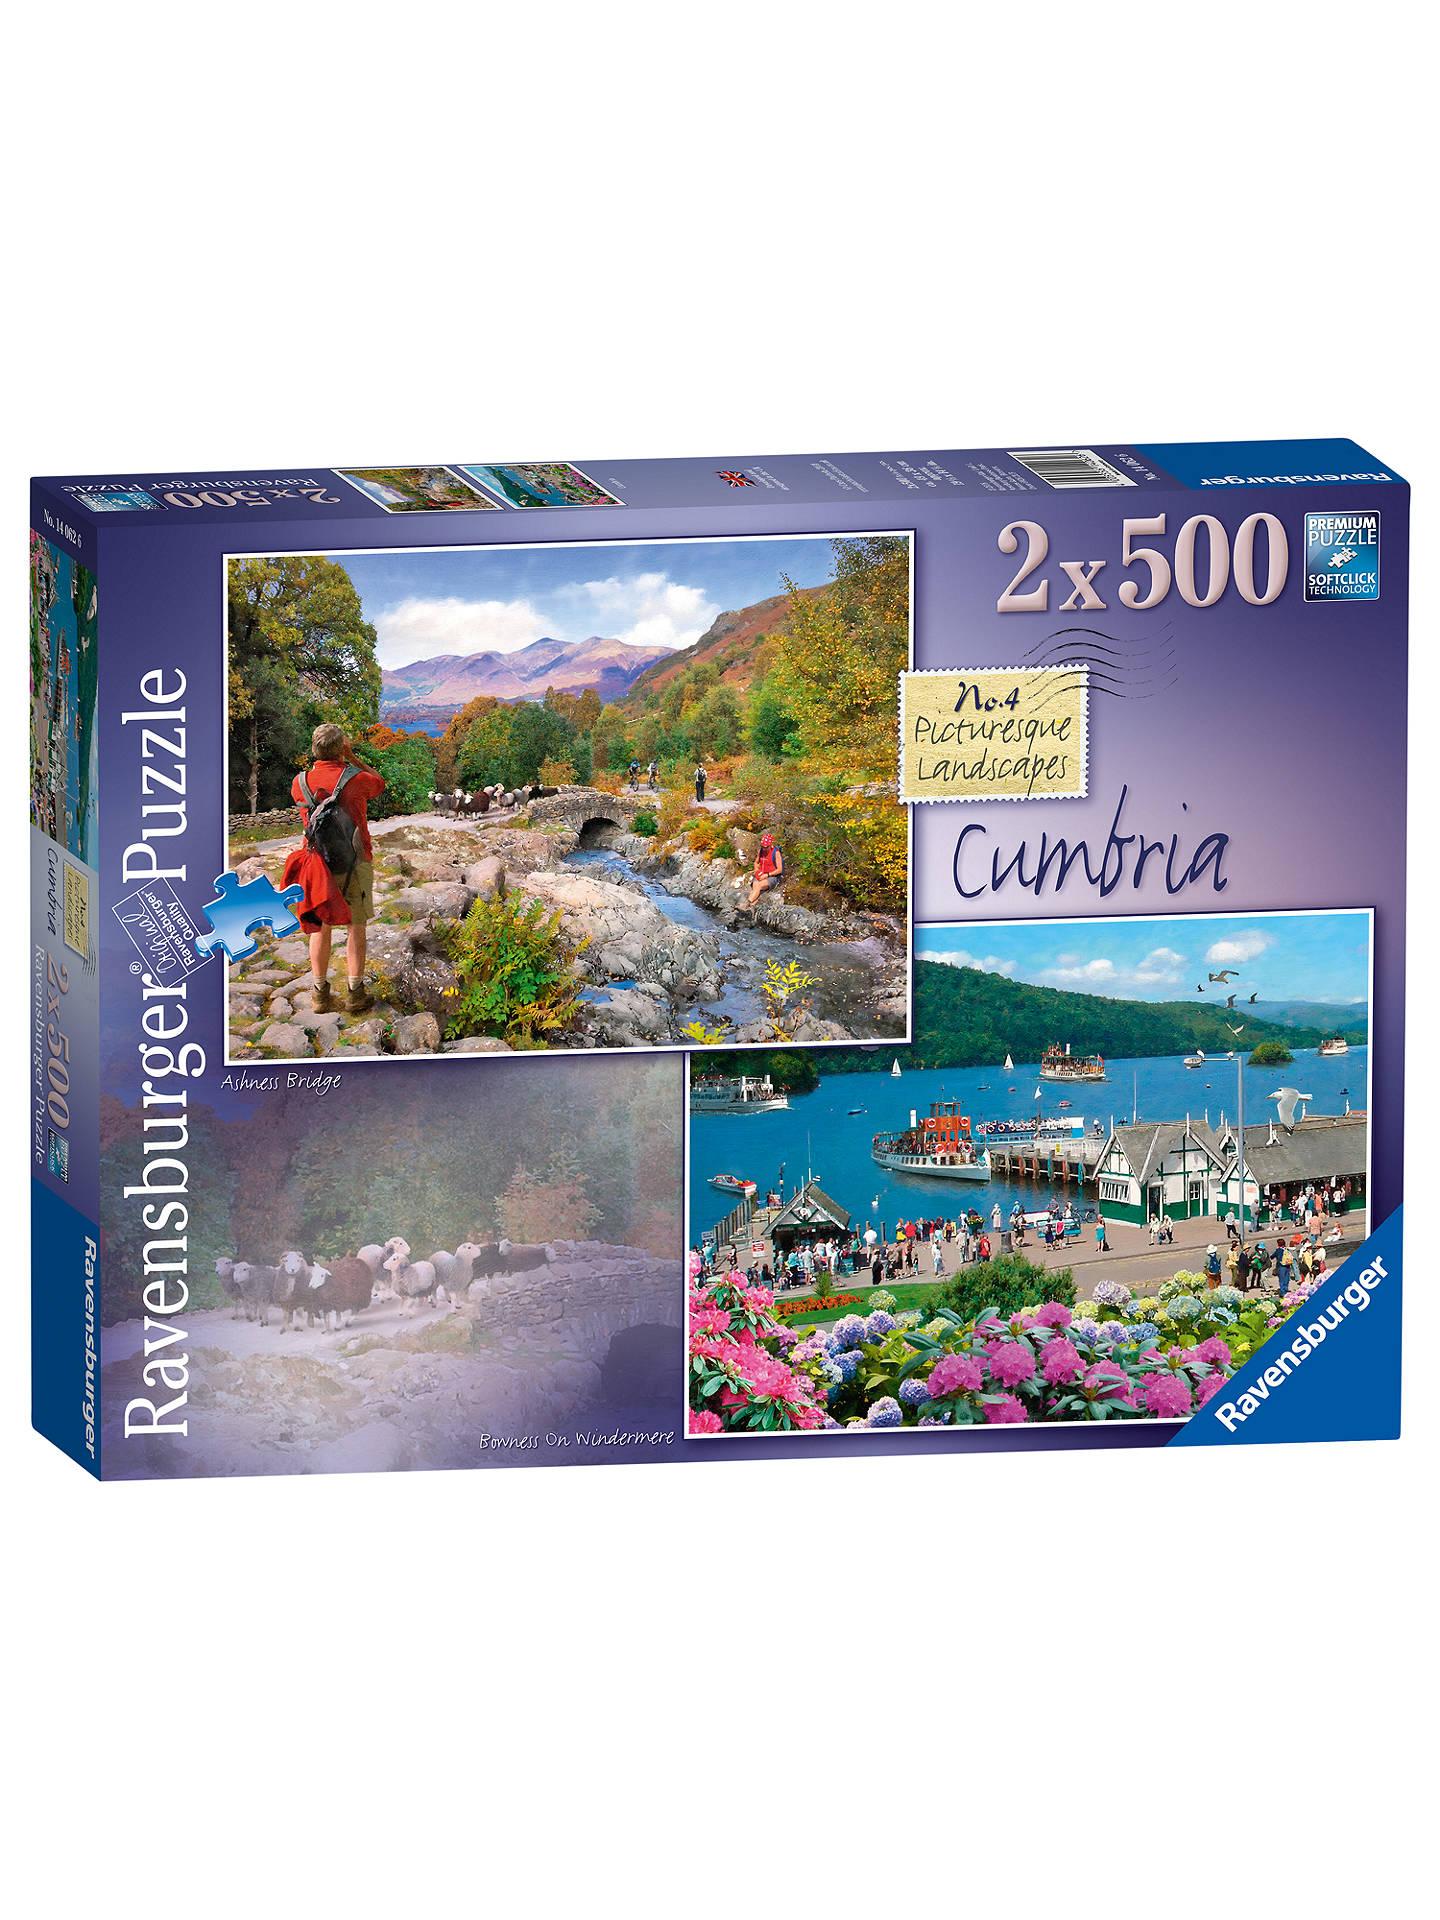 ravensburger picturesque cumbria jigsaw puzzles 500 pieces pack of